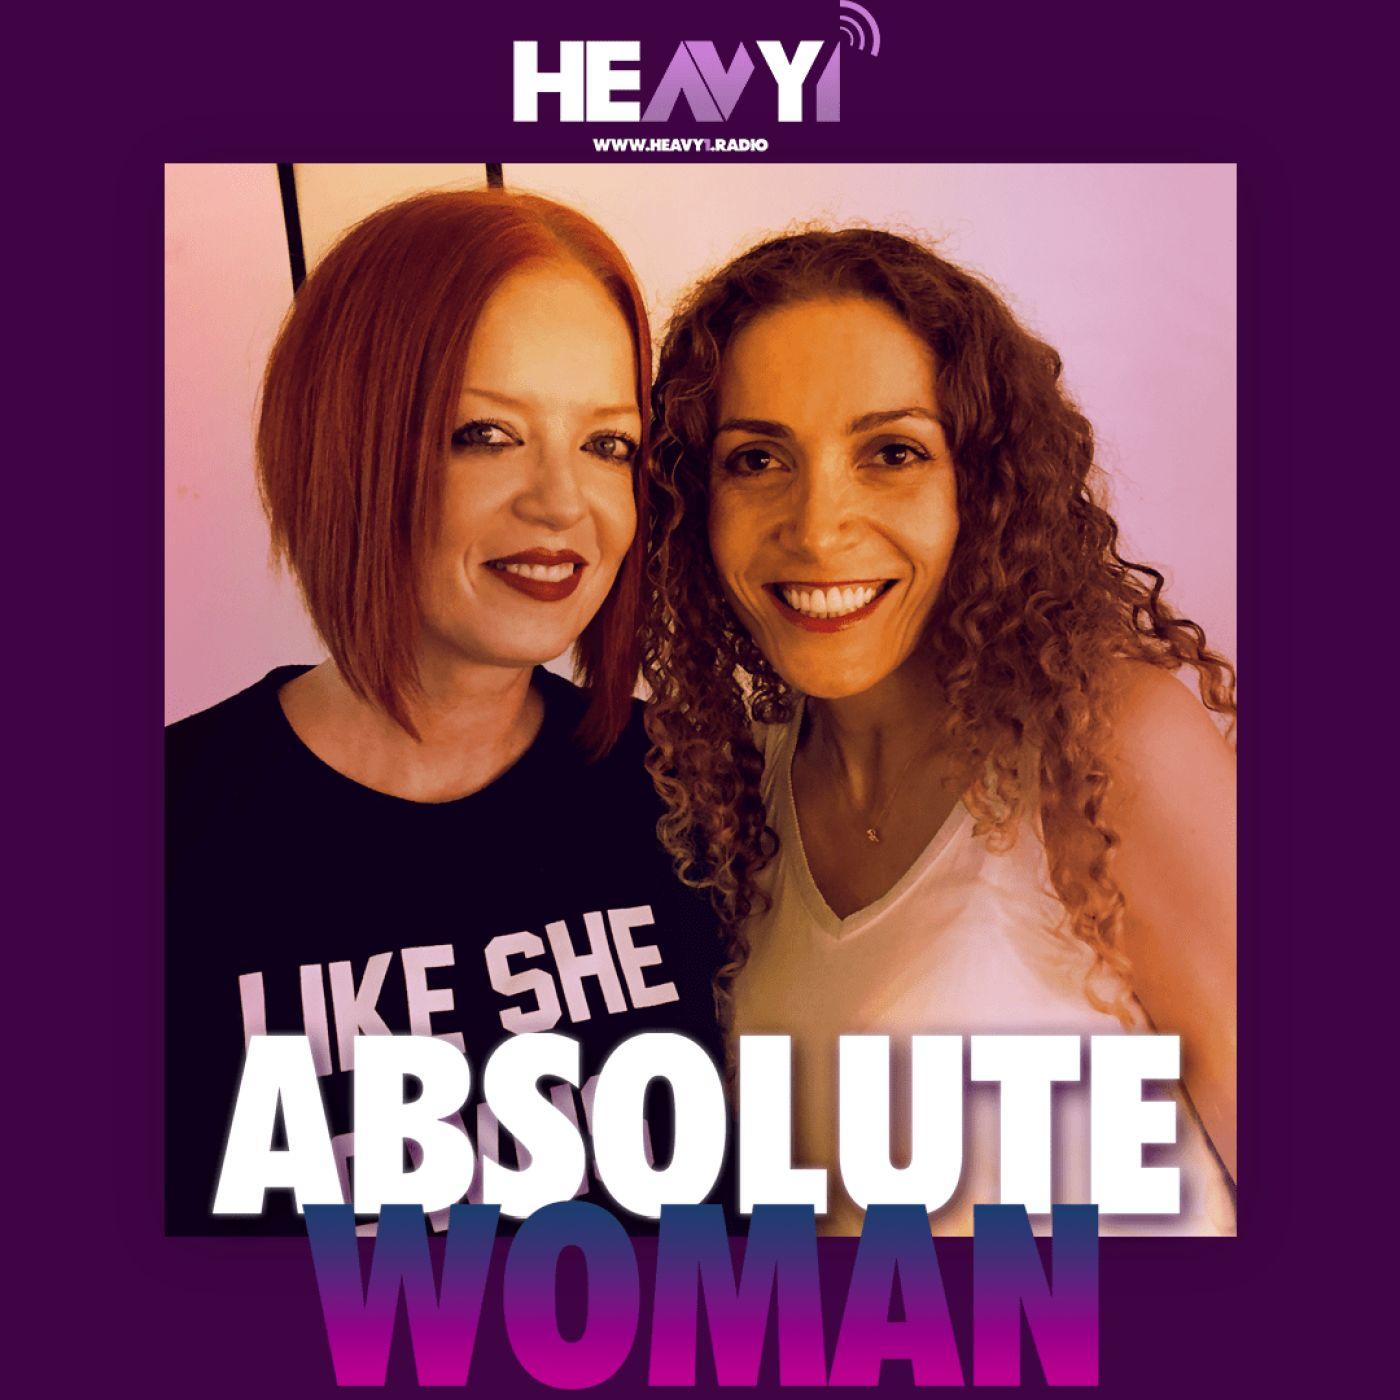 Absolute Woman : Shirley Manson • Garbage (Ep.3 Saison 2)